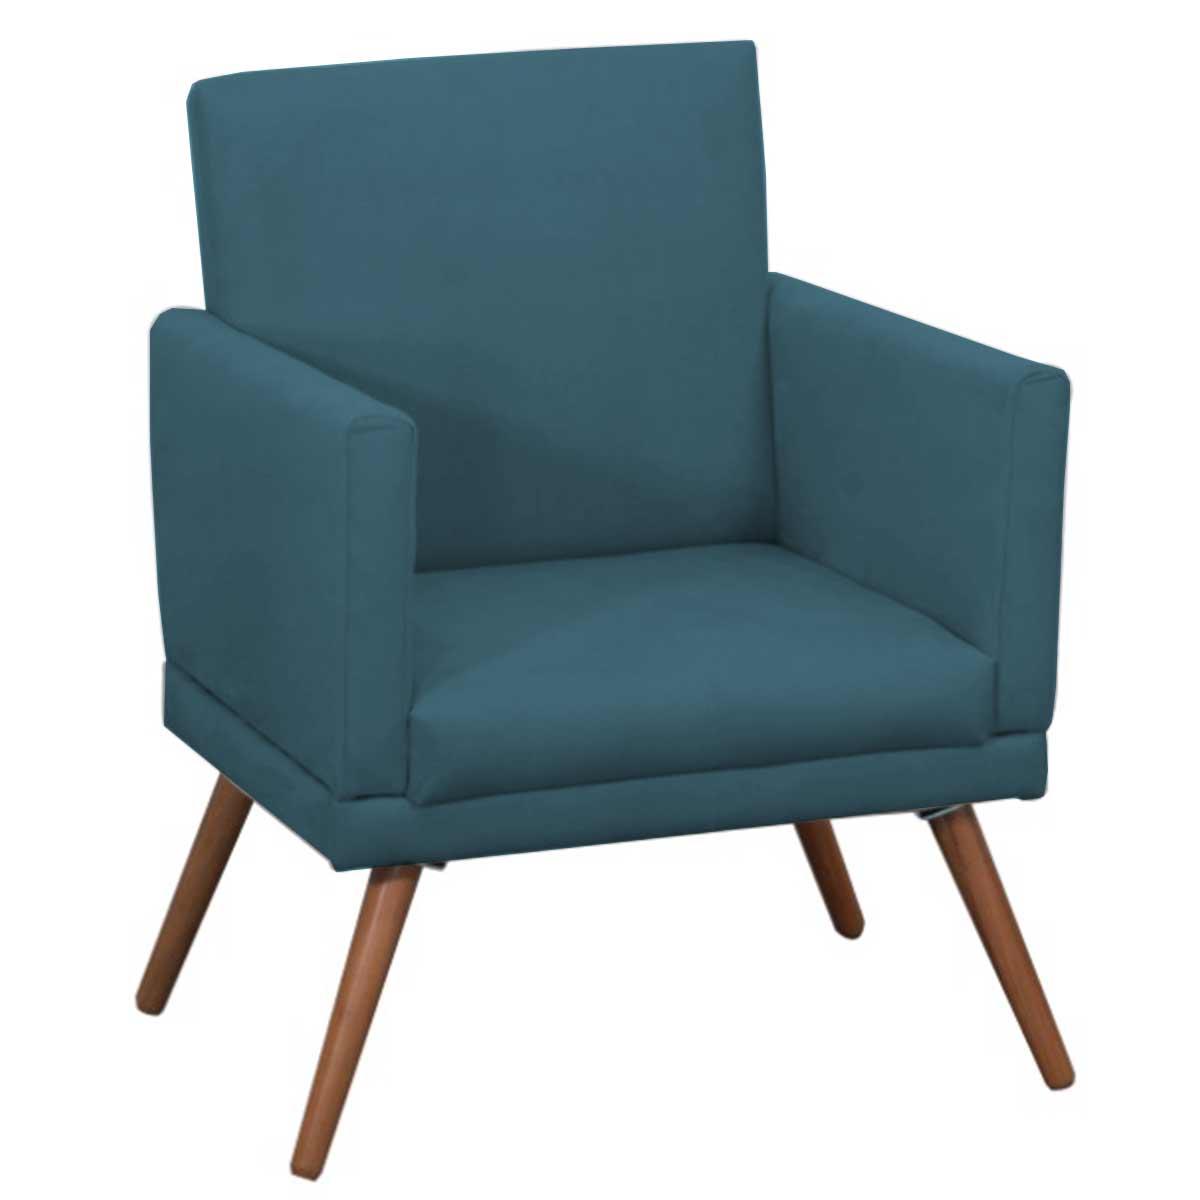 Poltrona Decorativa New Nina Pé Palito Suede Azul Turquesa